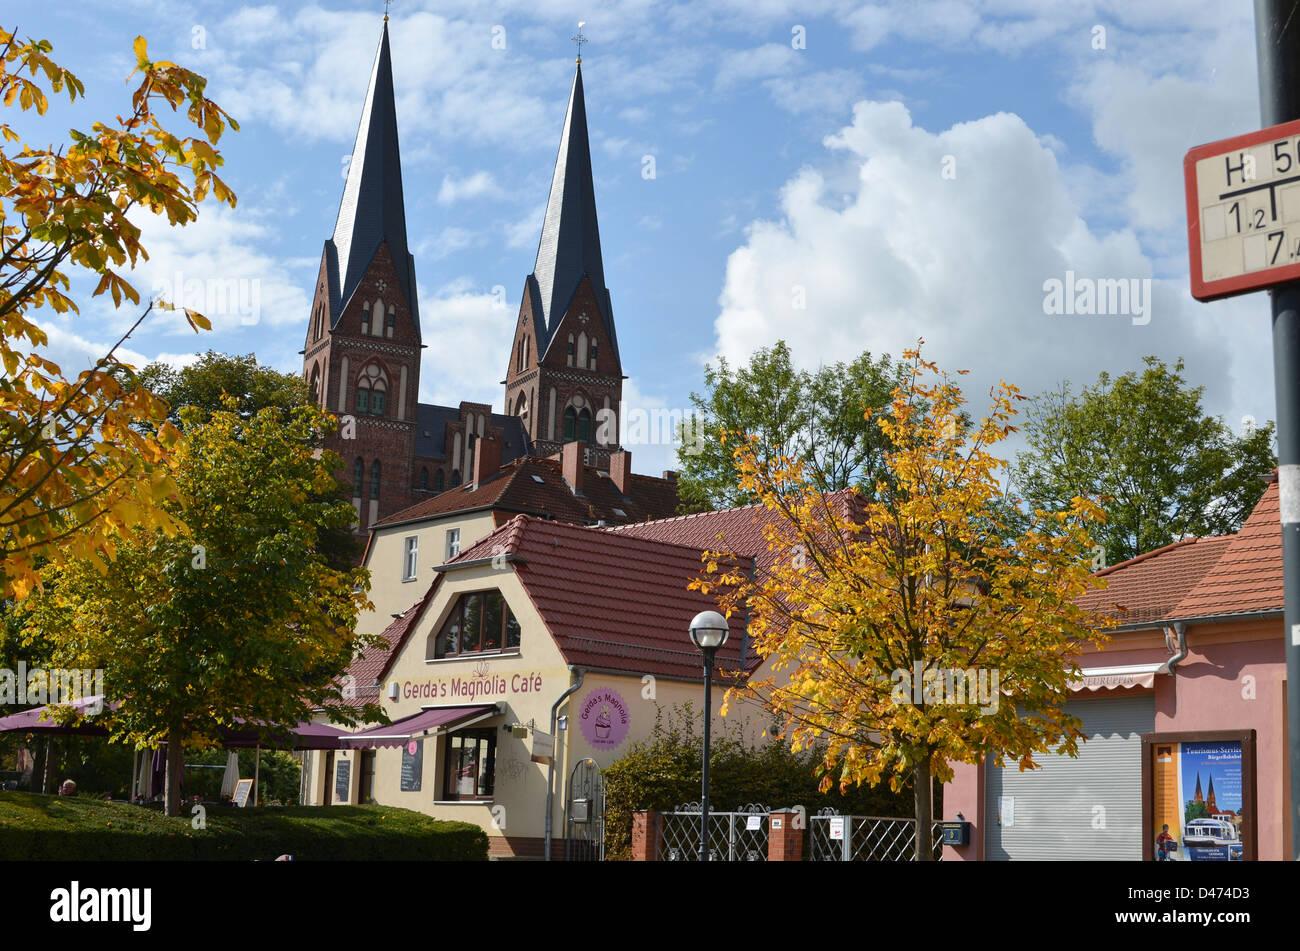 Germany, Lubeck - Stock Image